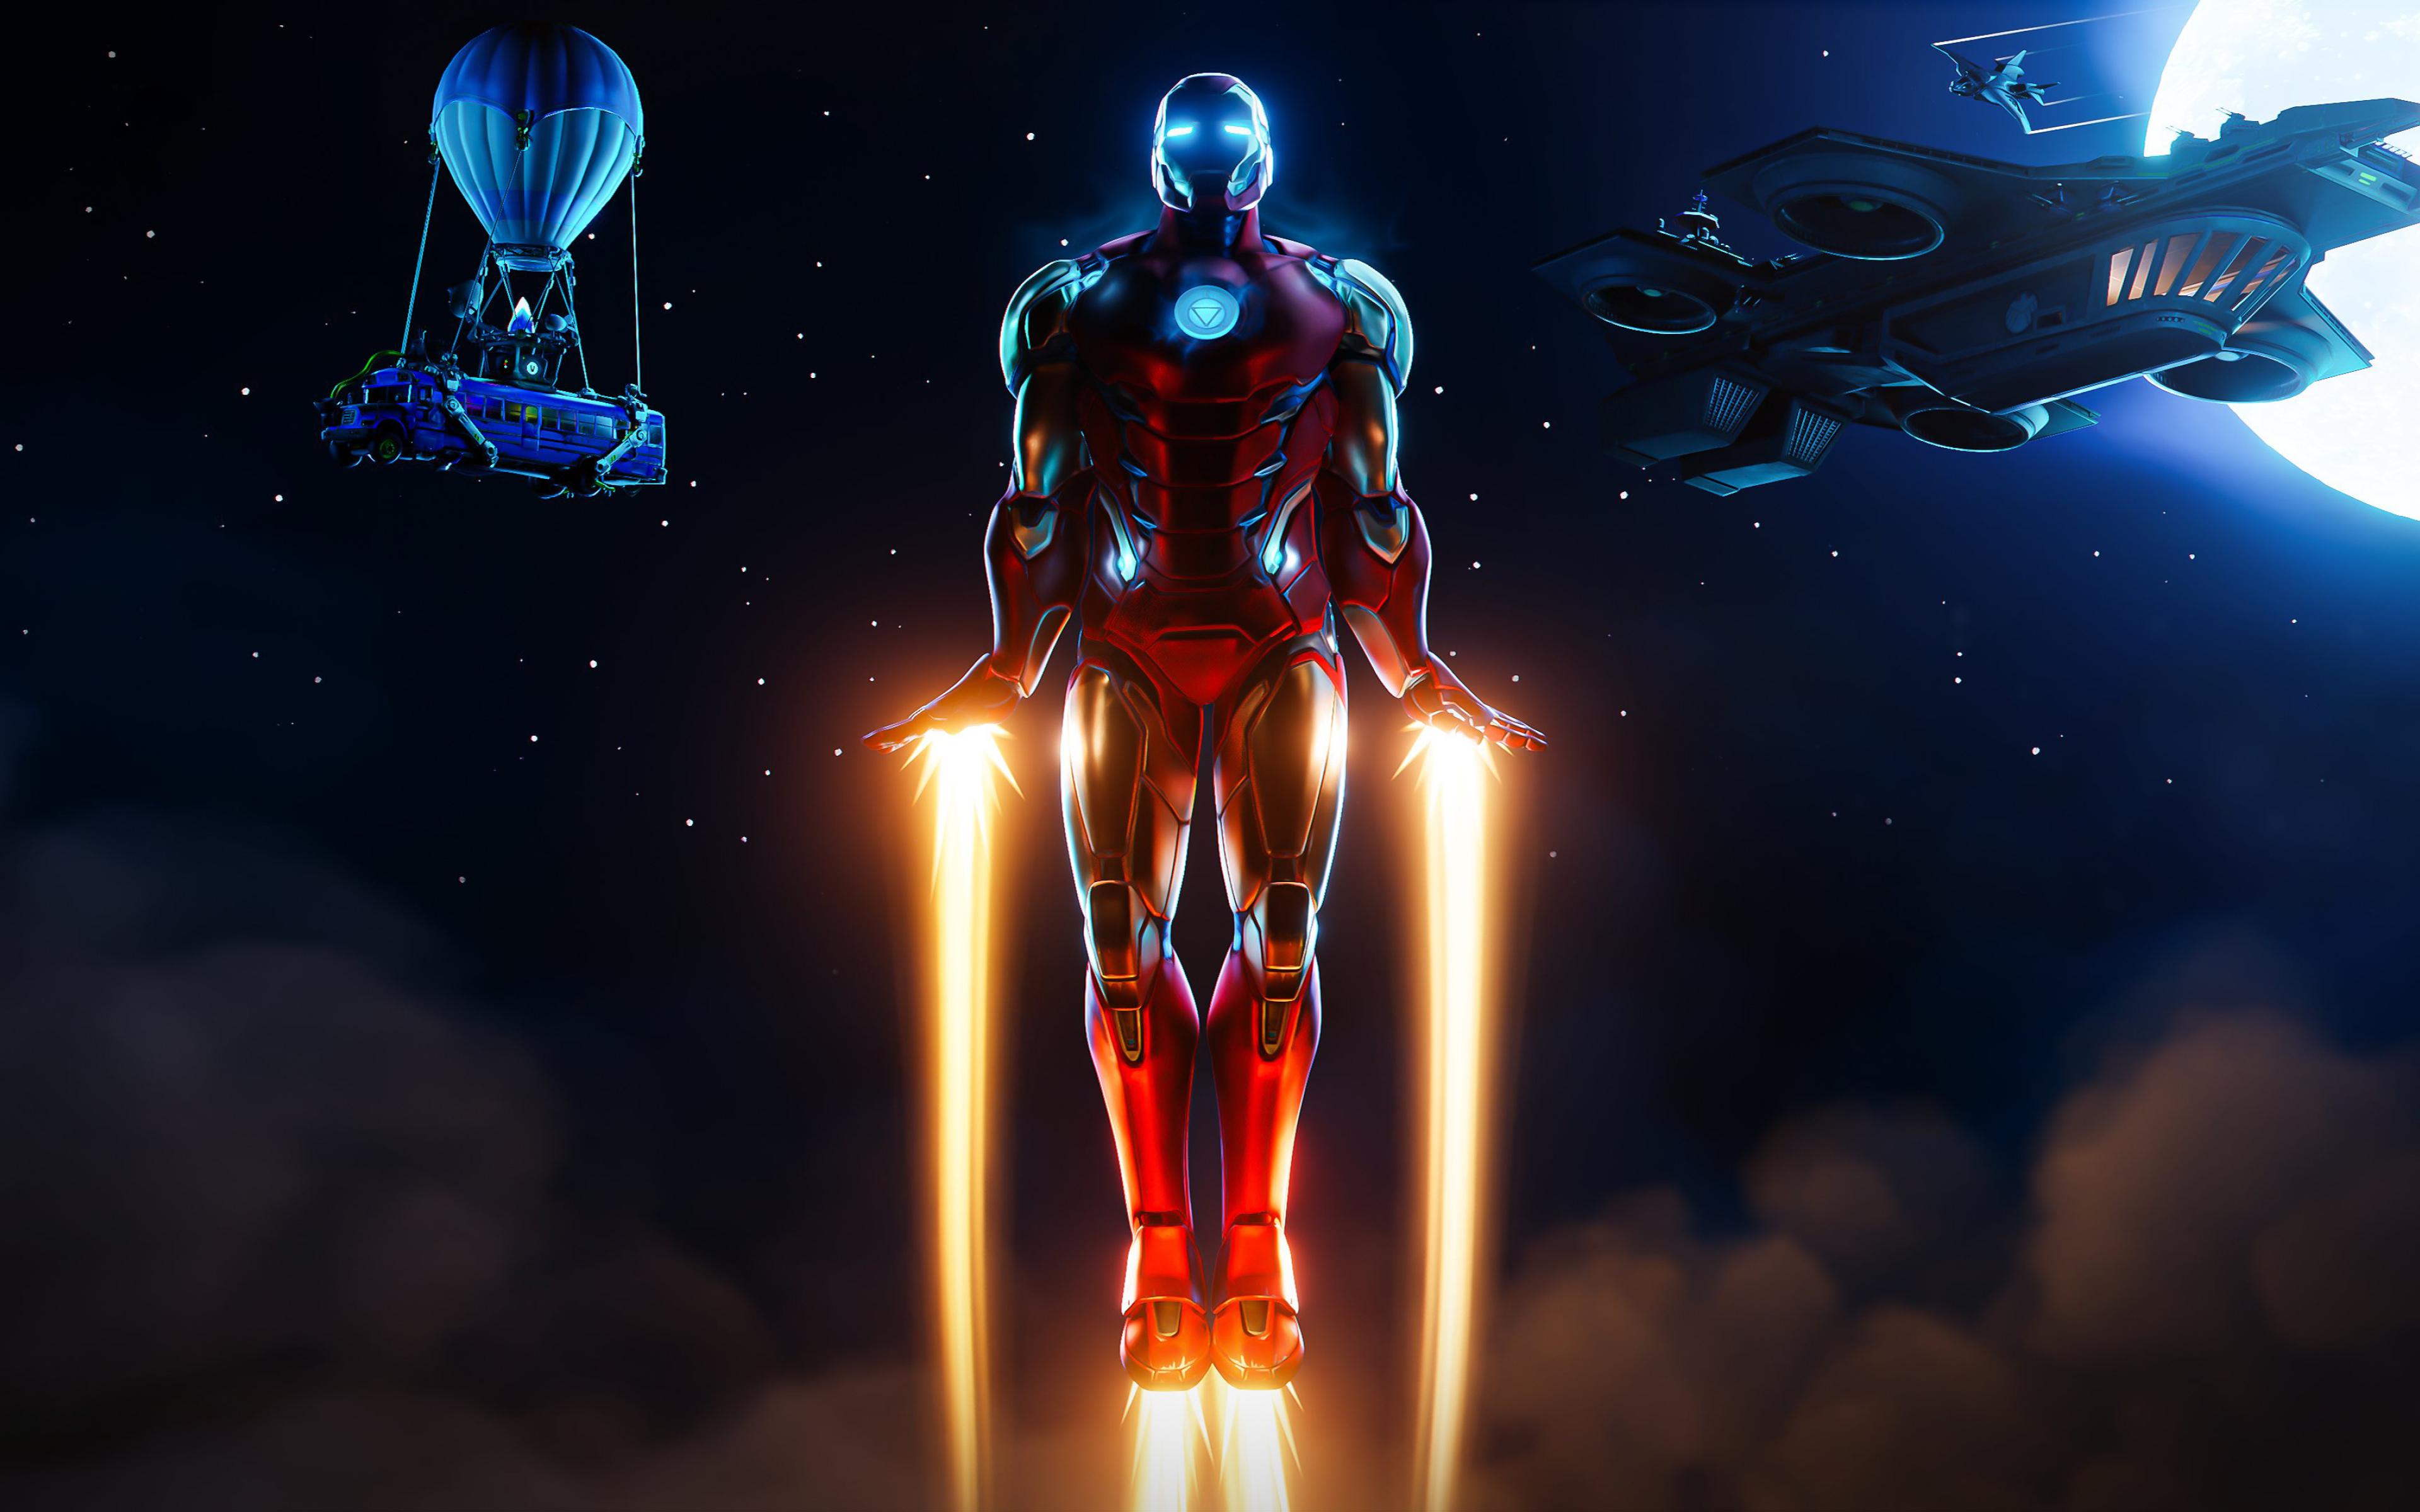 3840x2400 Iron Man Fortnite UHD 4K 3840x2400 Resolution ...